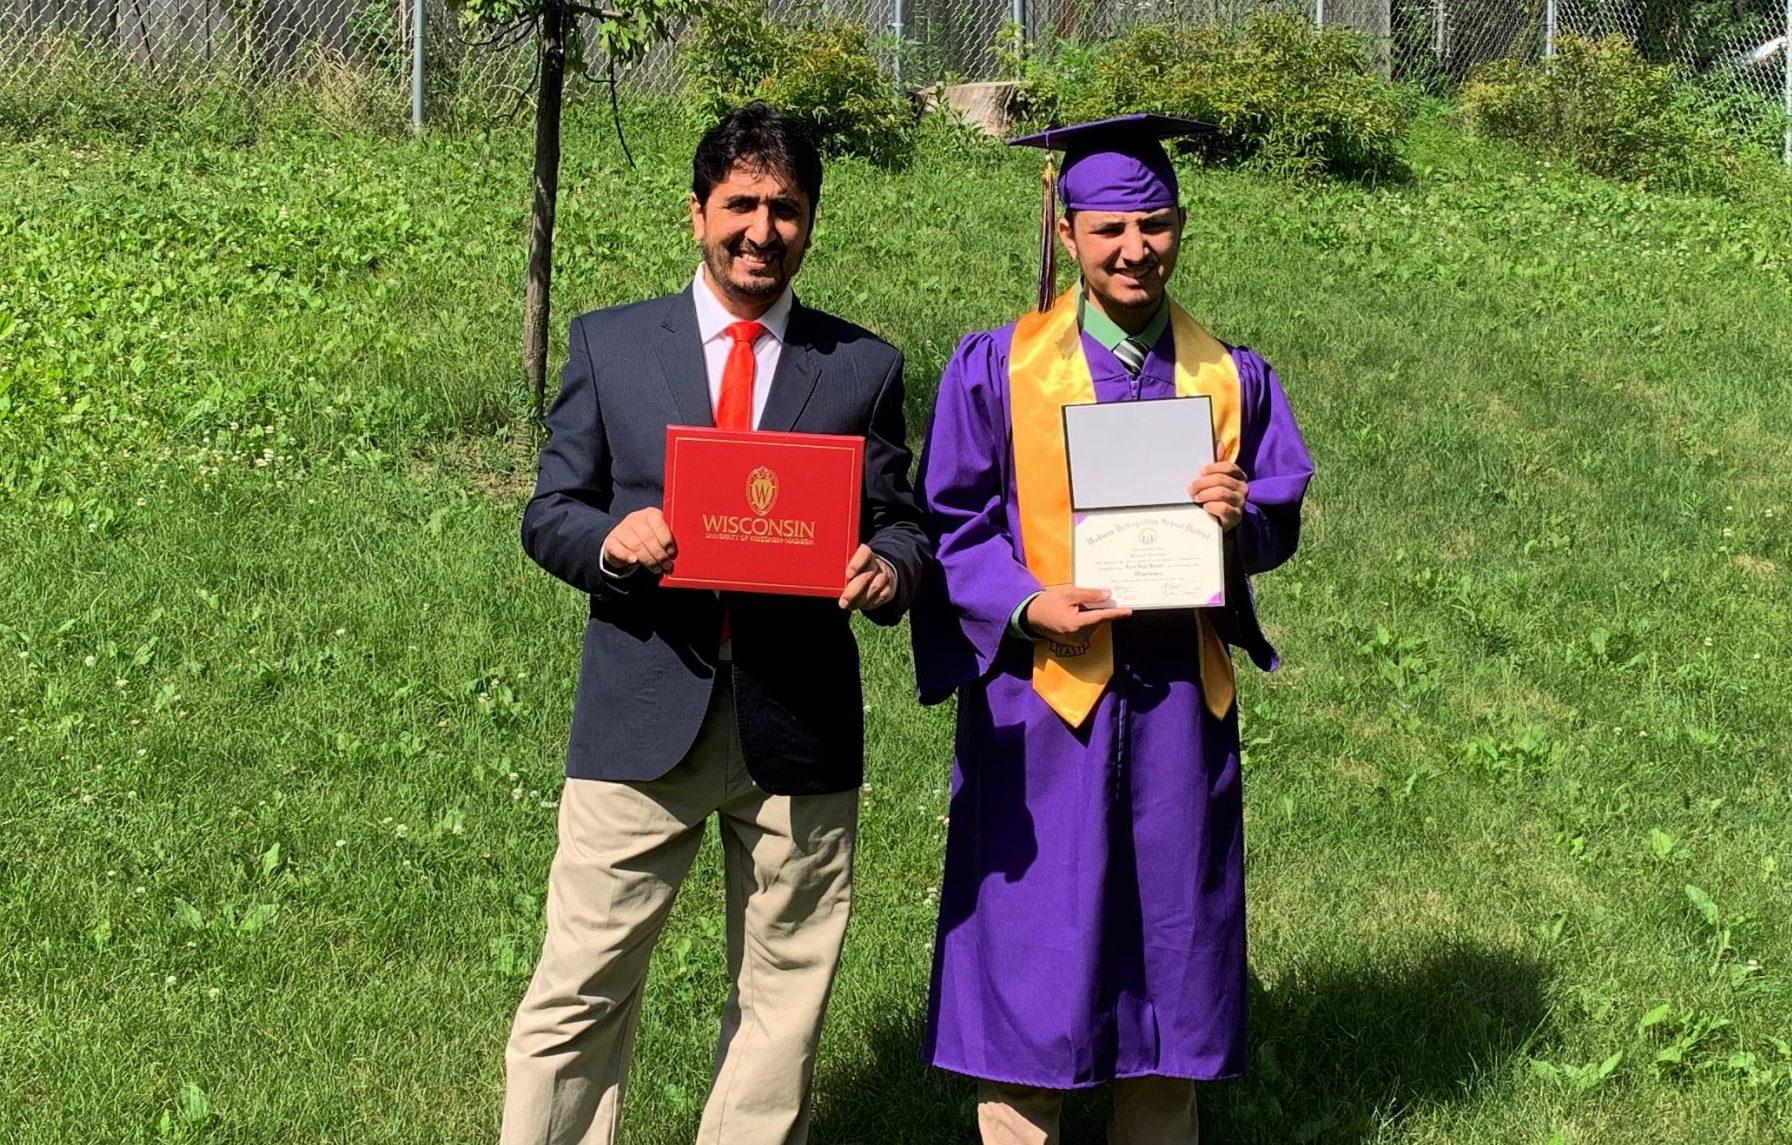 Abdullah Mustafa and Son Graduation